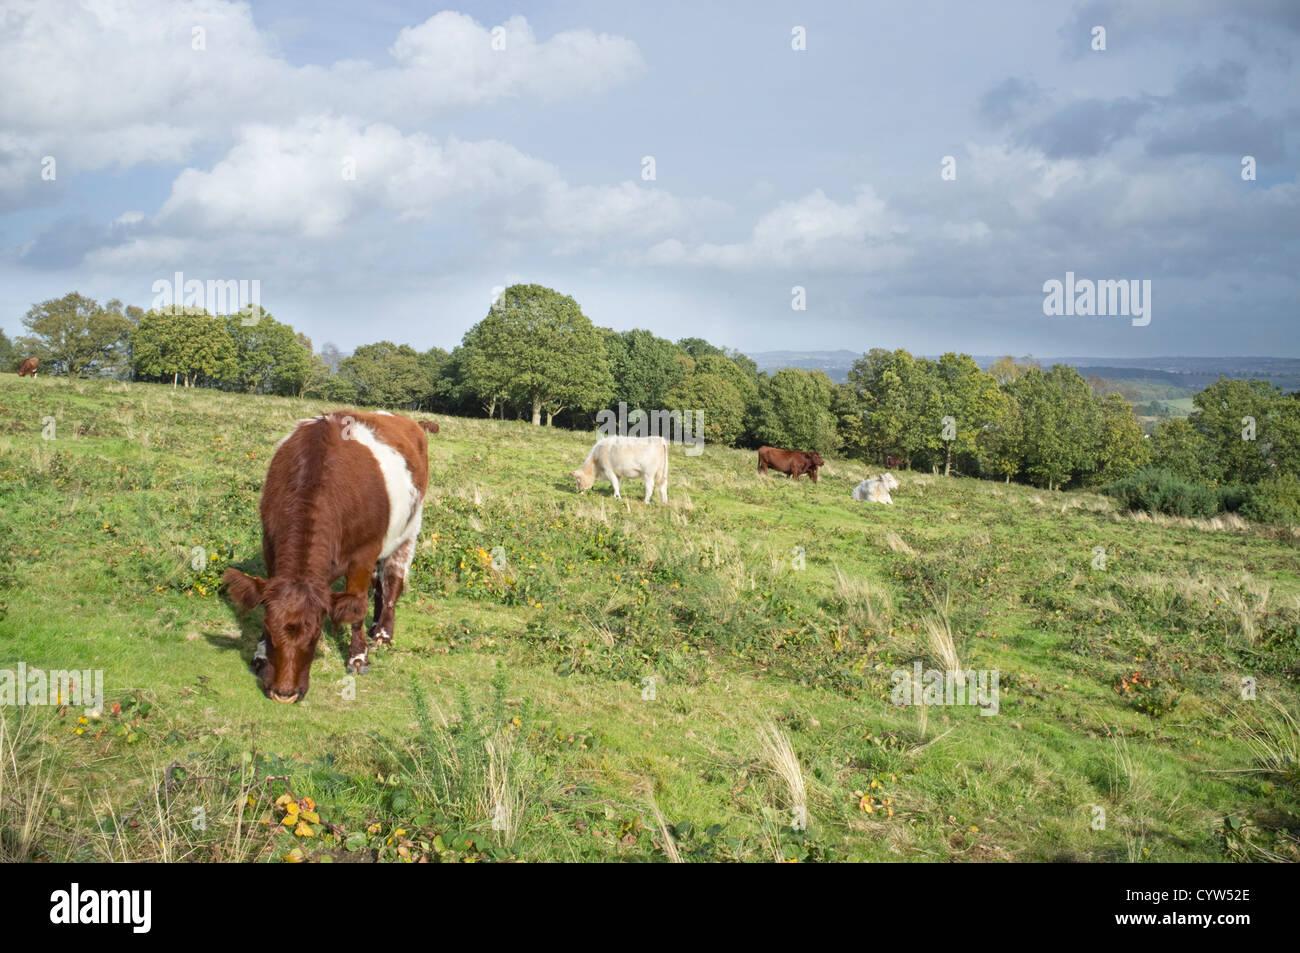 Short Horn cattle grazing on National Trust's Kinver Edge, Staffordshire, England, UK - Stock Image